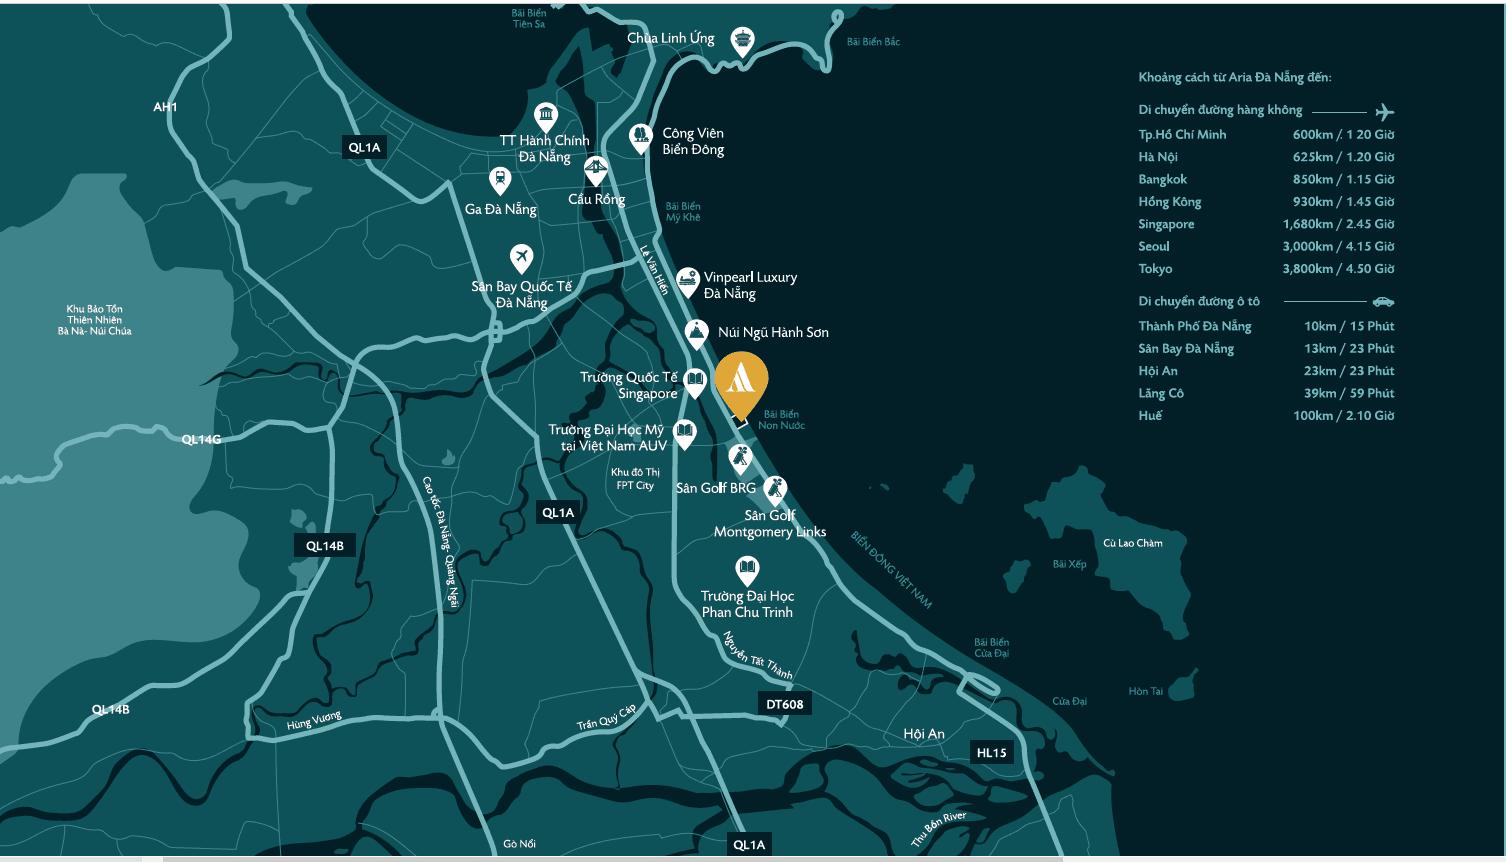 Map vi tri du an aria da nang - DỰ ÁN ARIA ĐÀ NẴNG HOTEL & RESORT - CONDOTEL & VILLAS BIỂN